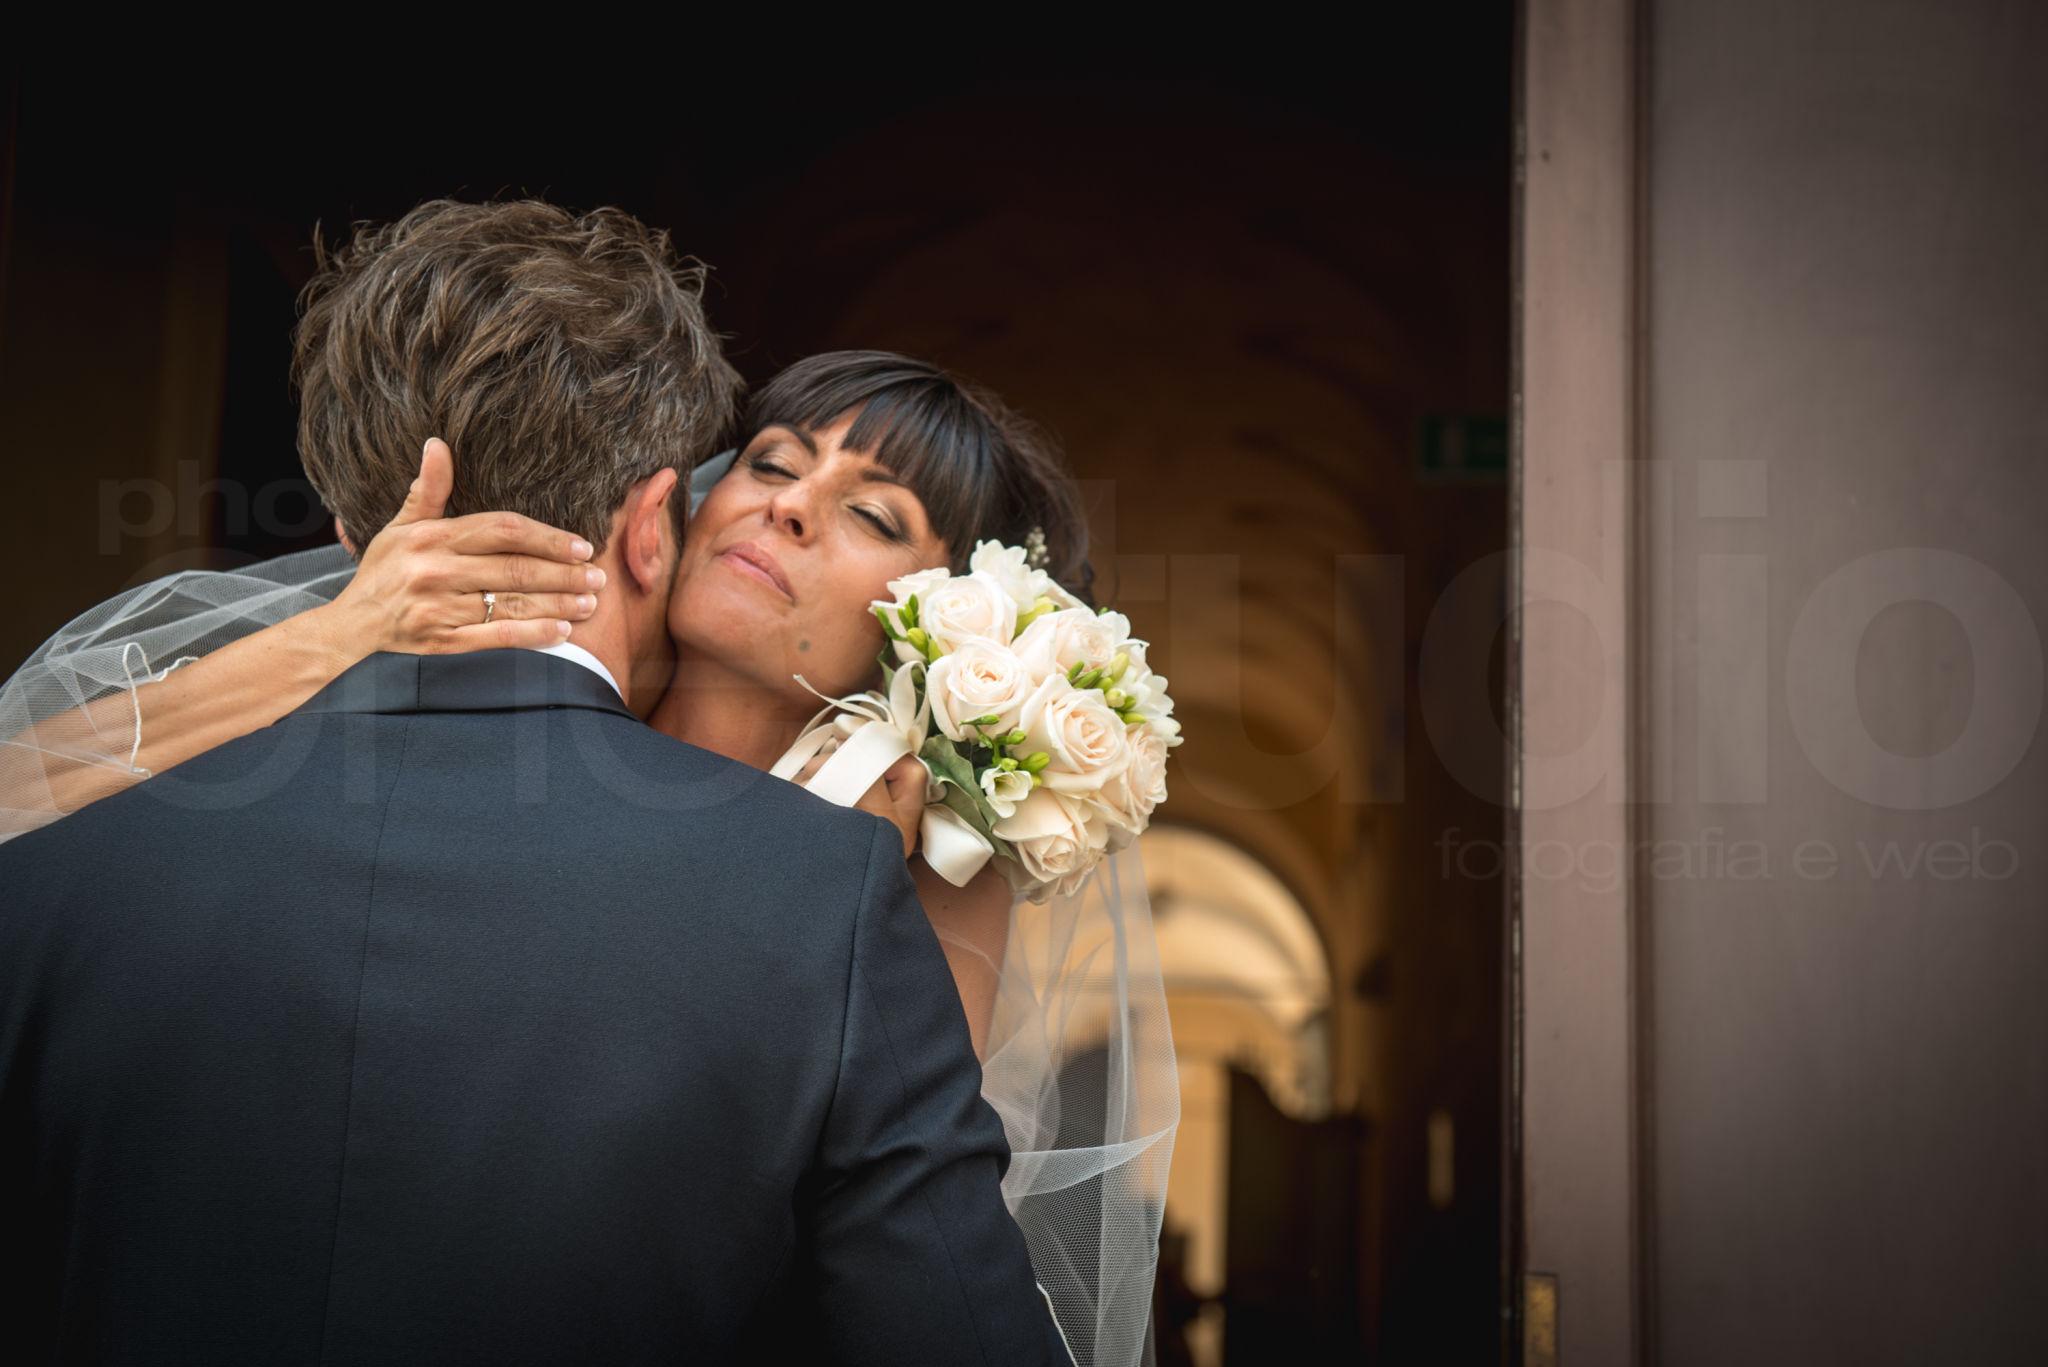 http://lnx.mirkone.it/wp-content/uploads/2015/07/fotografo-matrimoni-faenza-0017.jpg